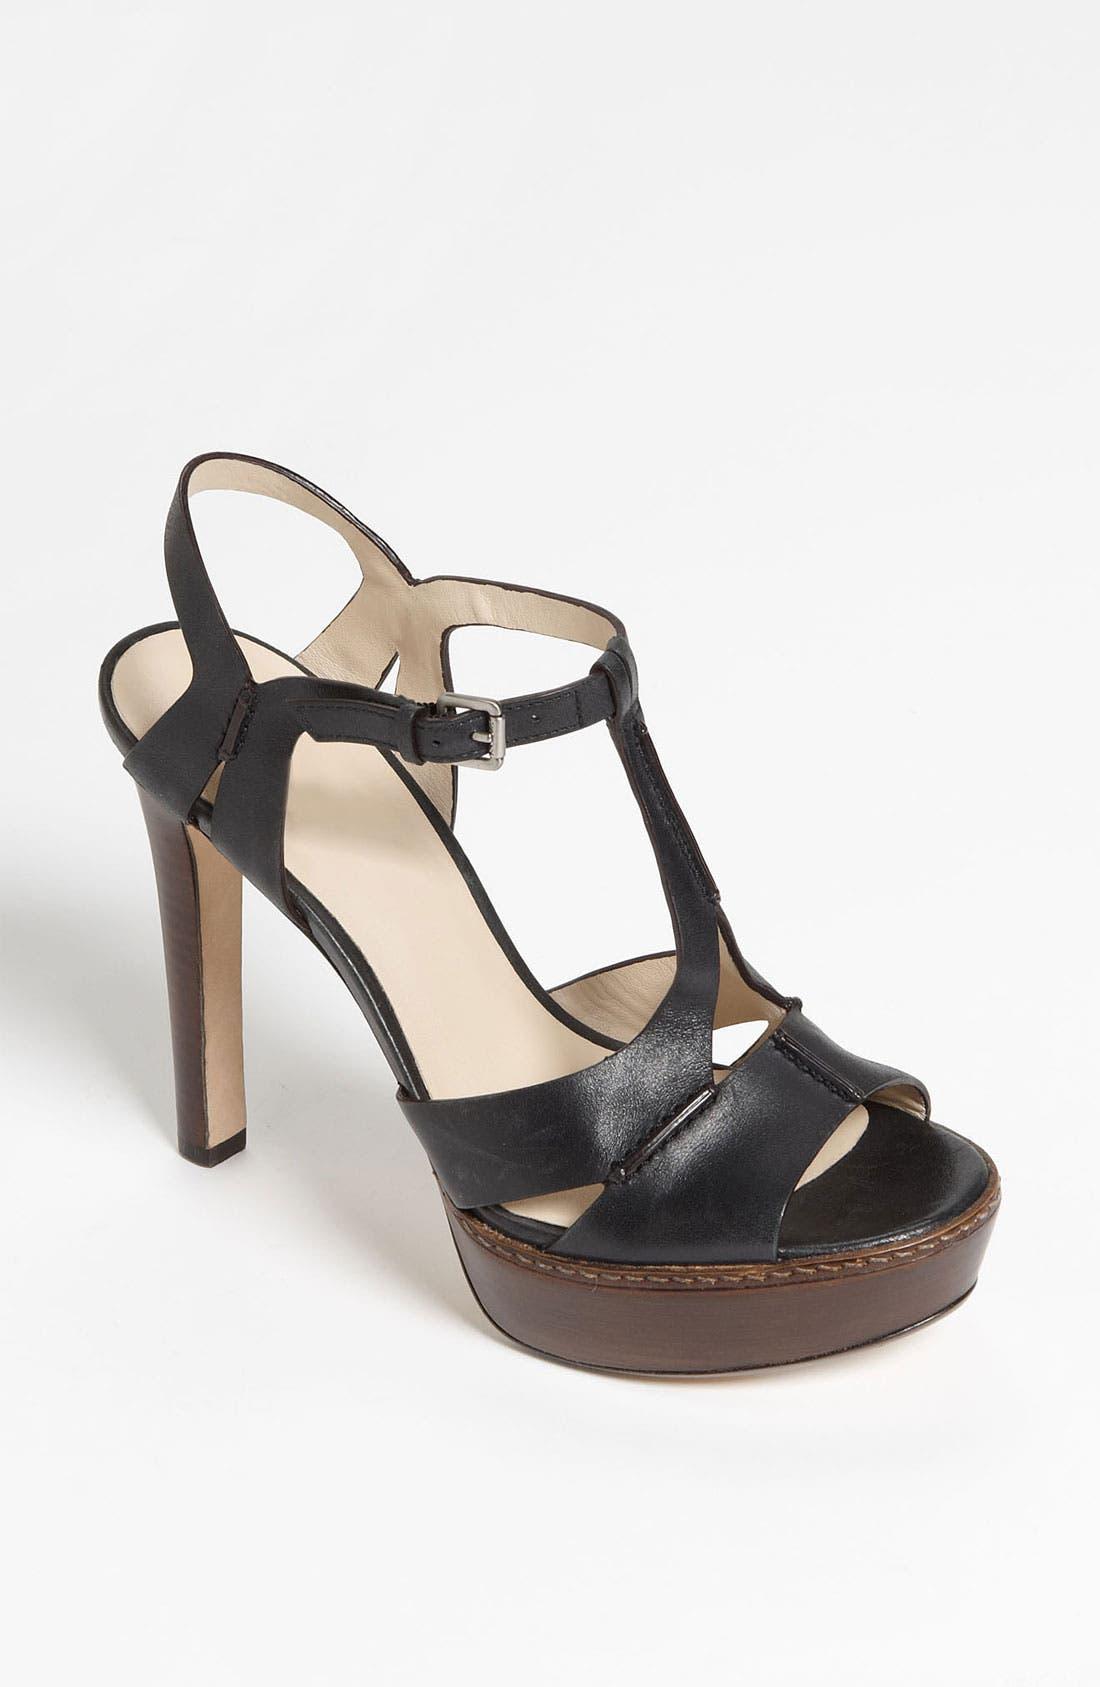 Main Image - KORS Michael Kors 'Brookton' Sandal